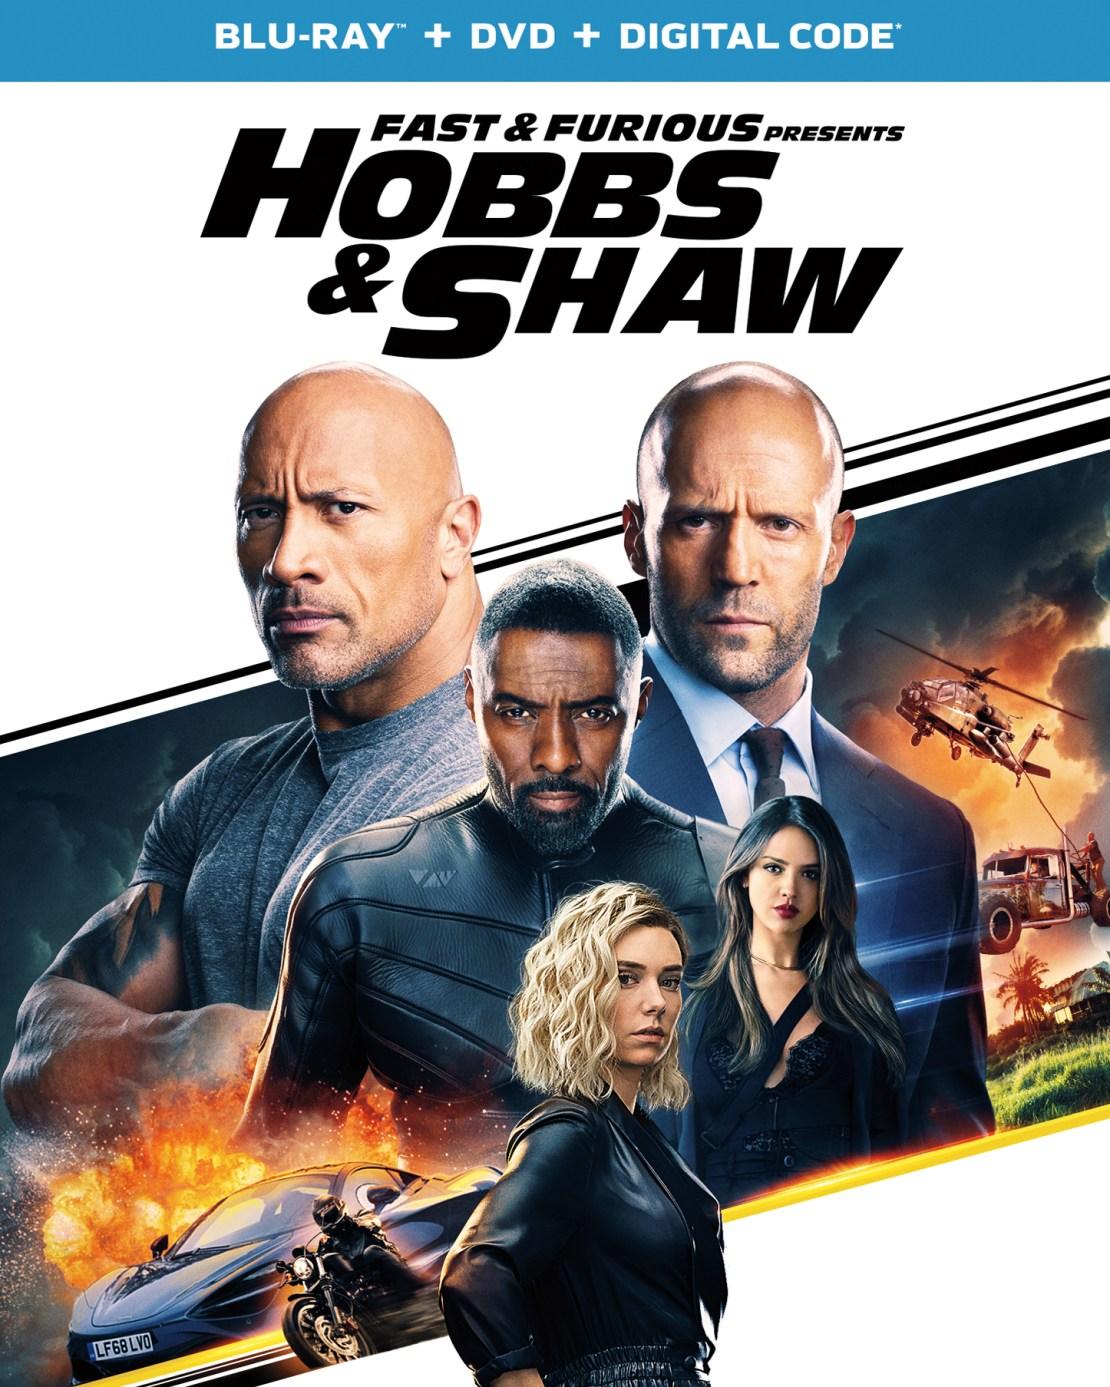 Fast & Furious Presents: Hobbs & Shaw [Includes Digital Copy] [Blu-ray/DVD] [2019]